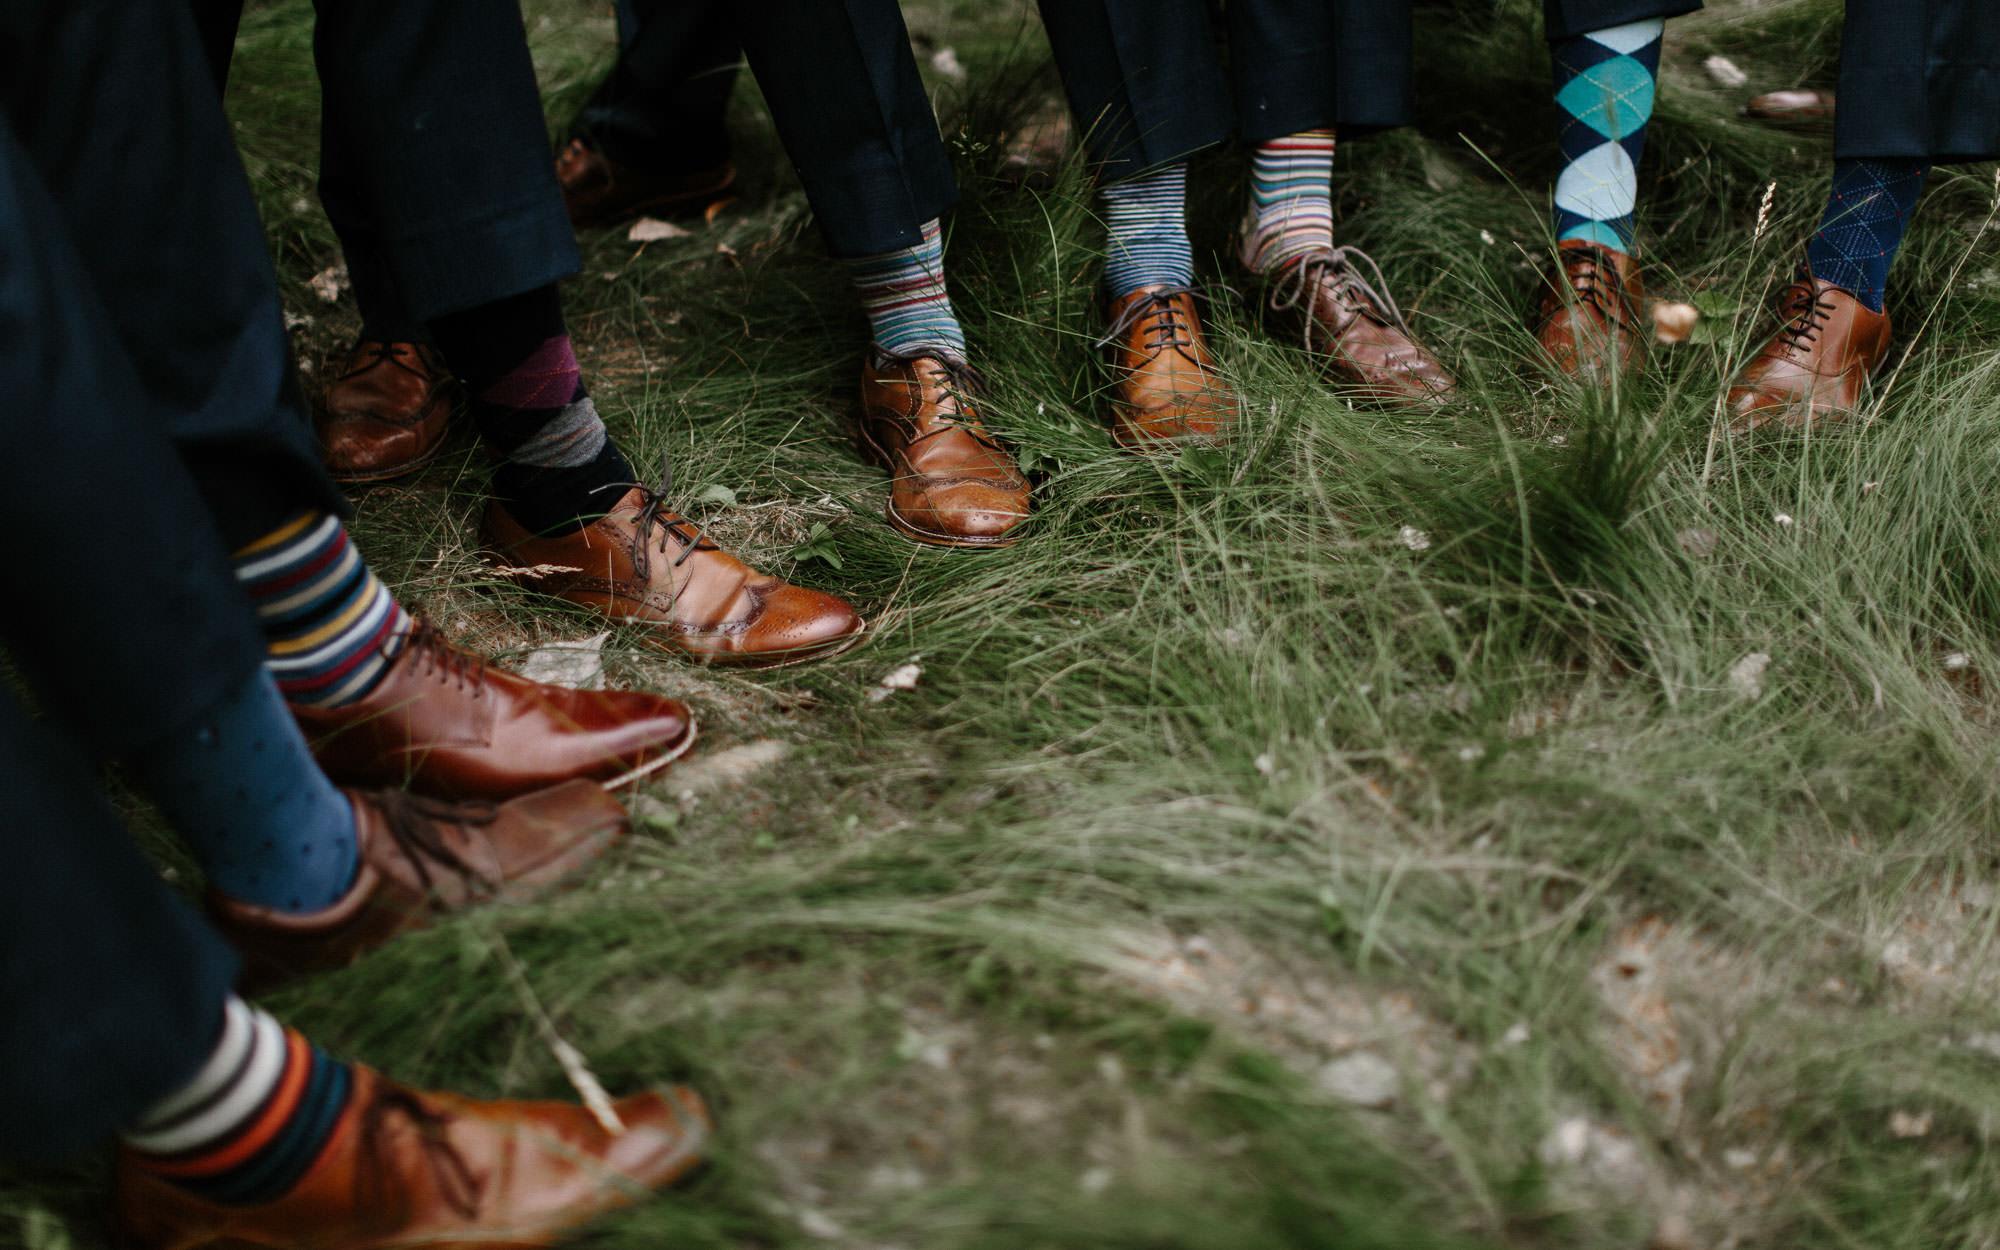 meadow-barn-wedding-sioux-falls-south-dakota-romantic-adventerous-michael-liedtke-photography045.jpg